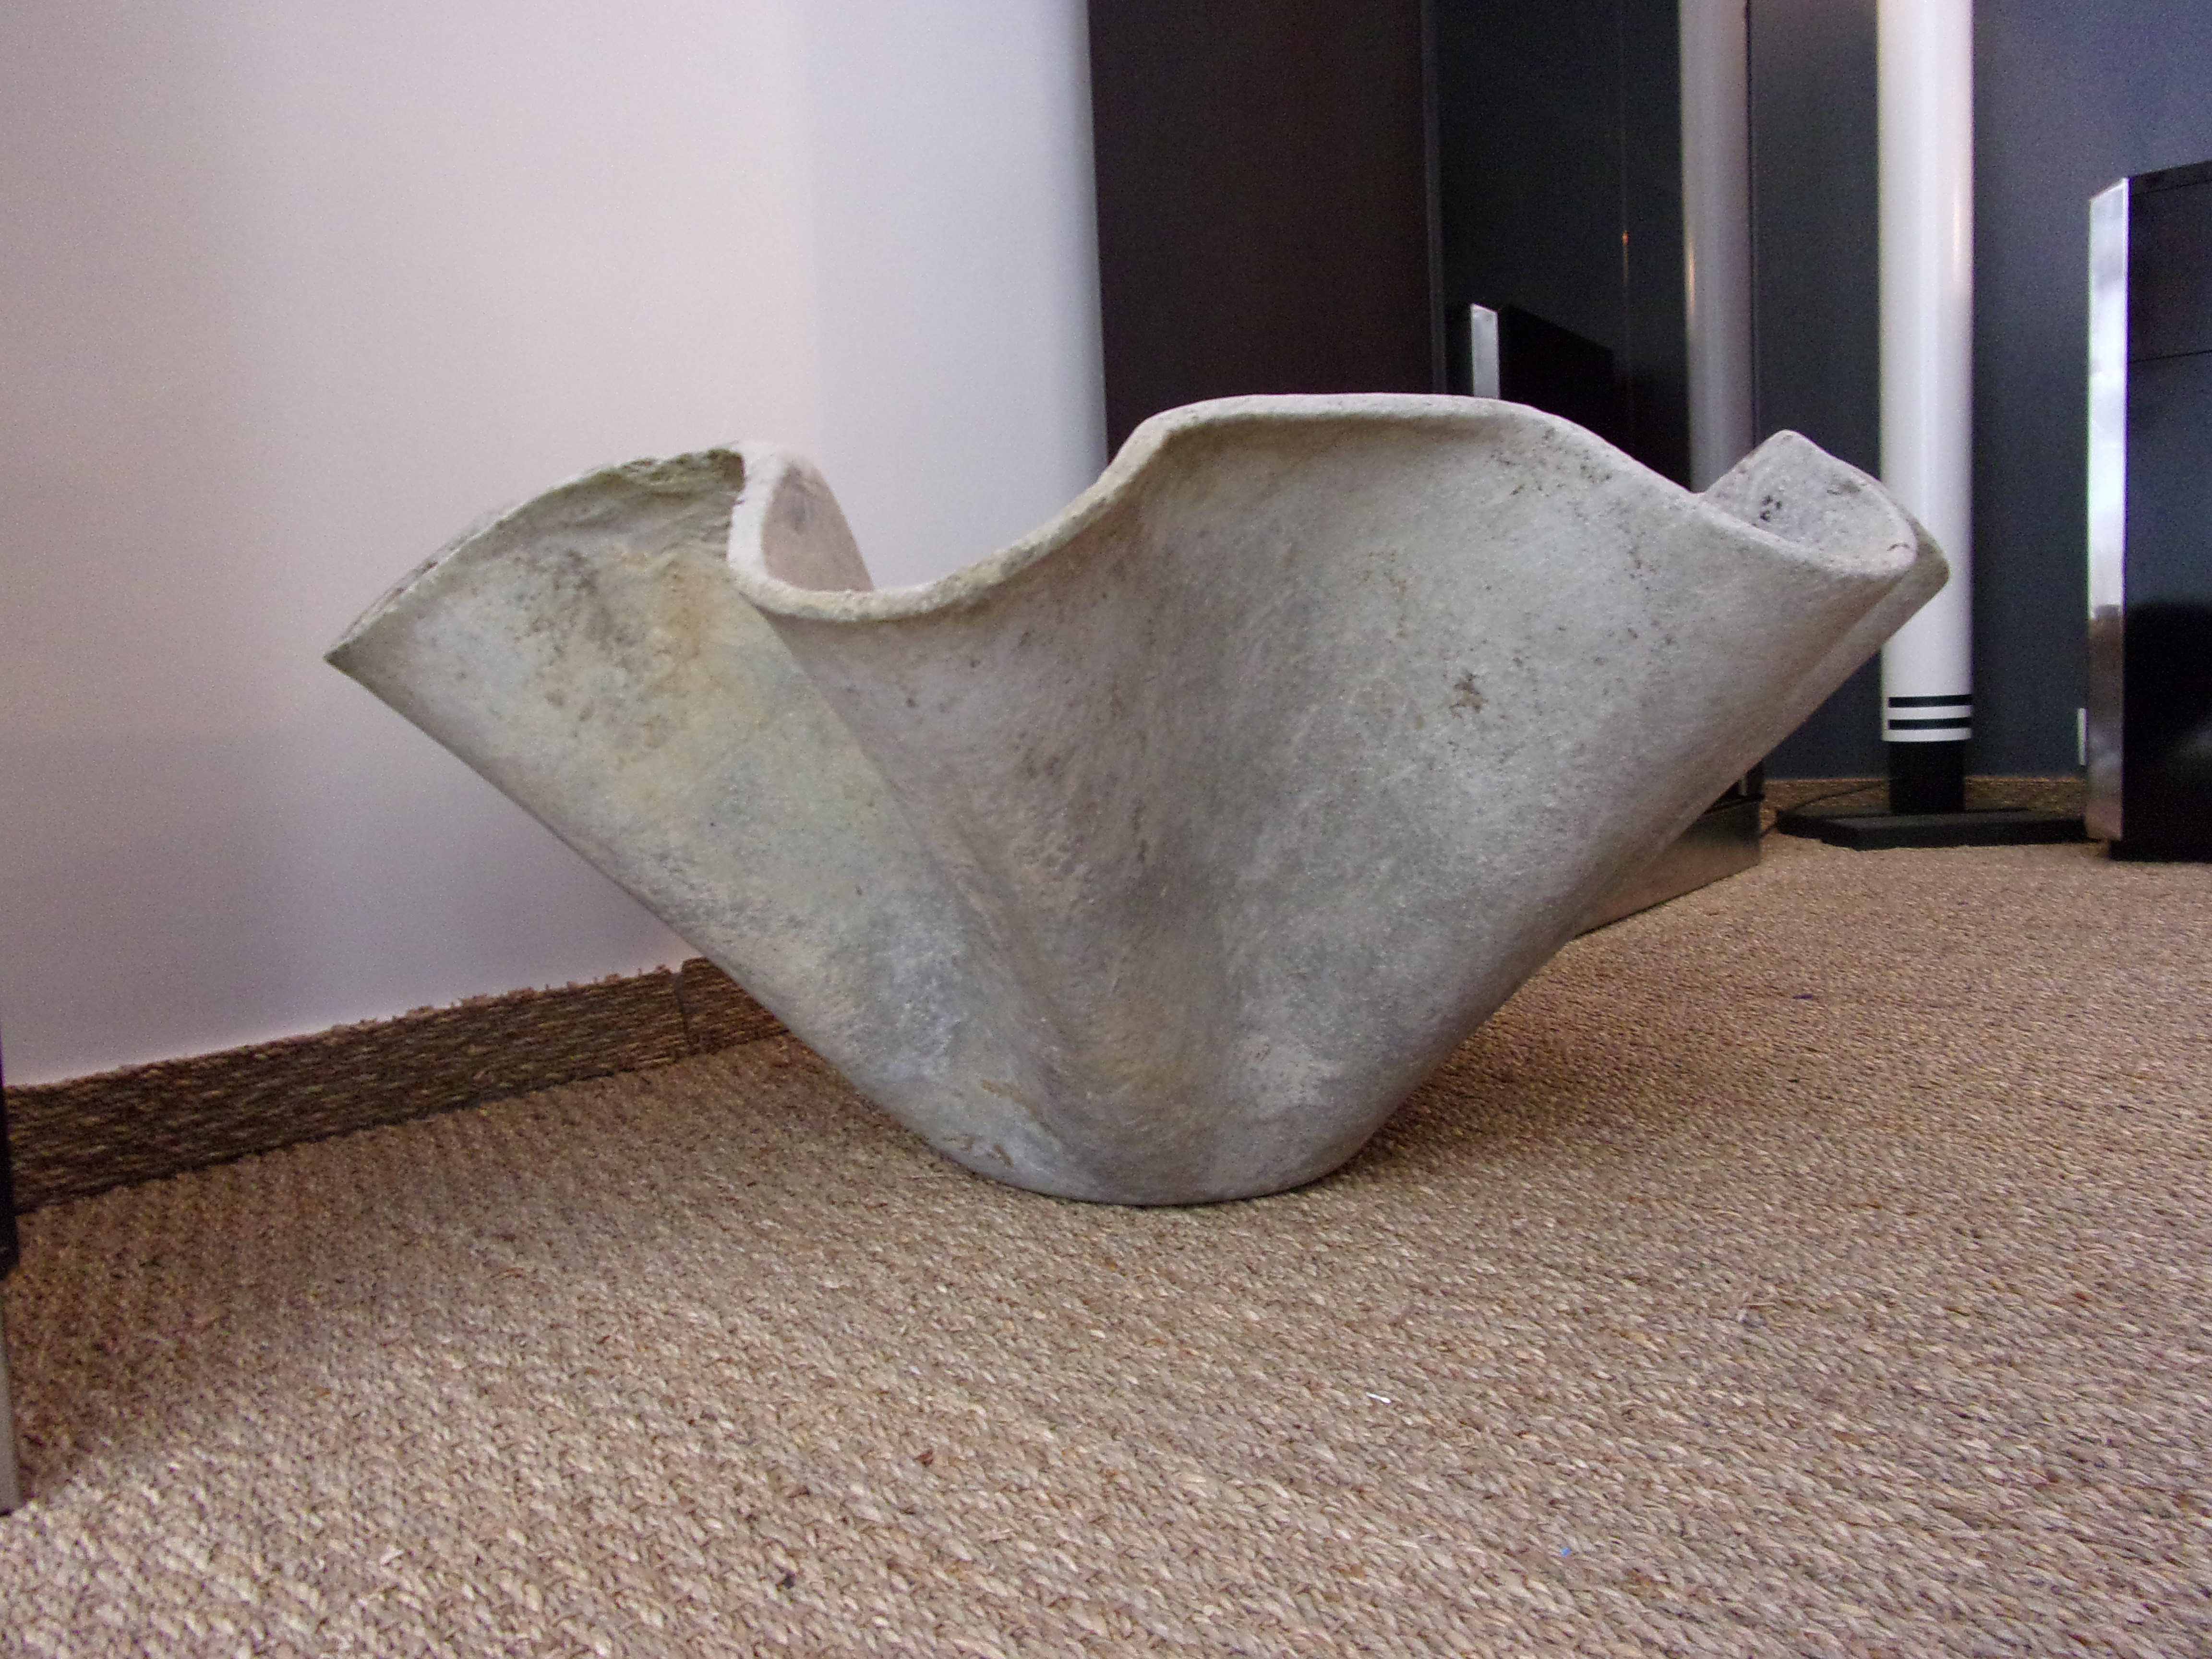 eternit planter handkerchief in fibro cement willy guhl. Black Bedroom Furniture Sets. Home Design Ideas